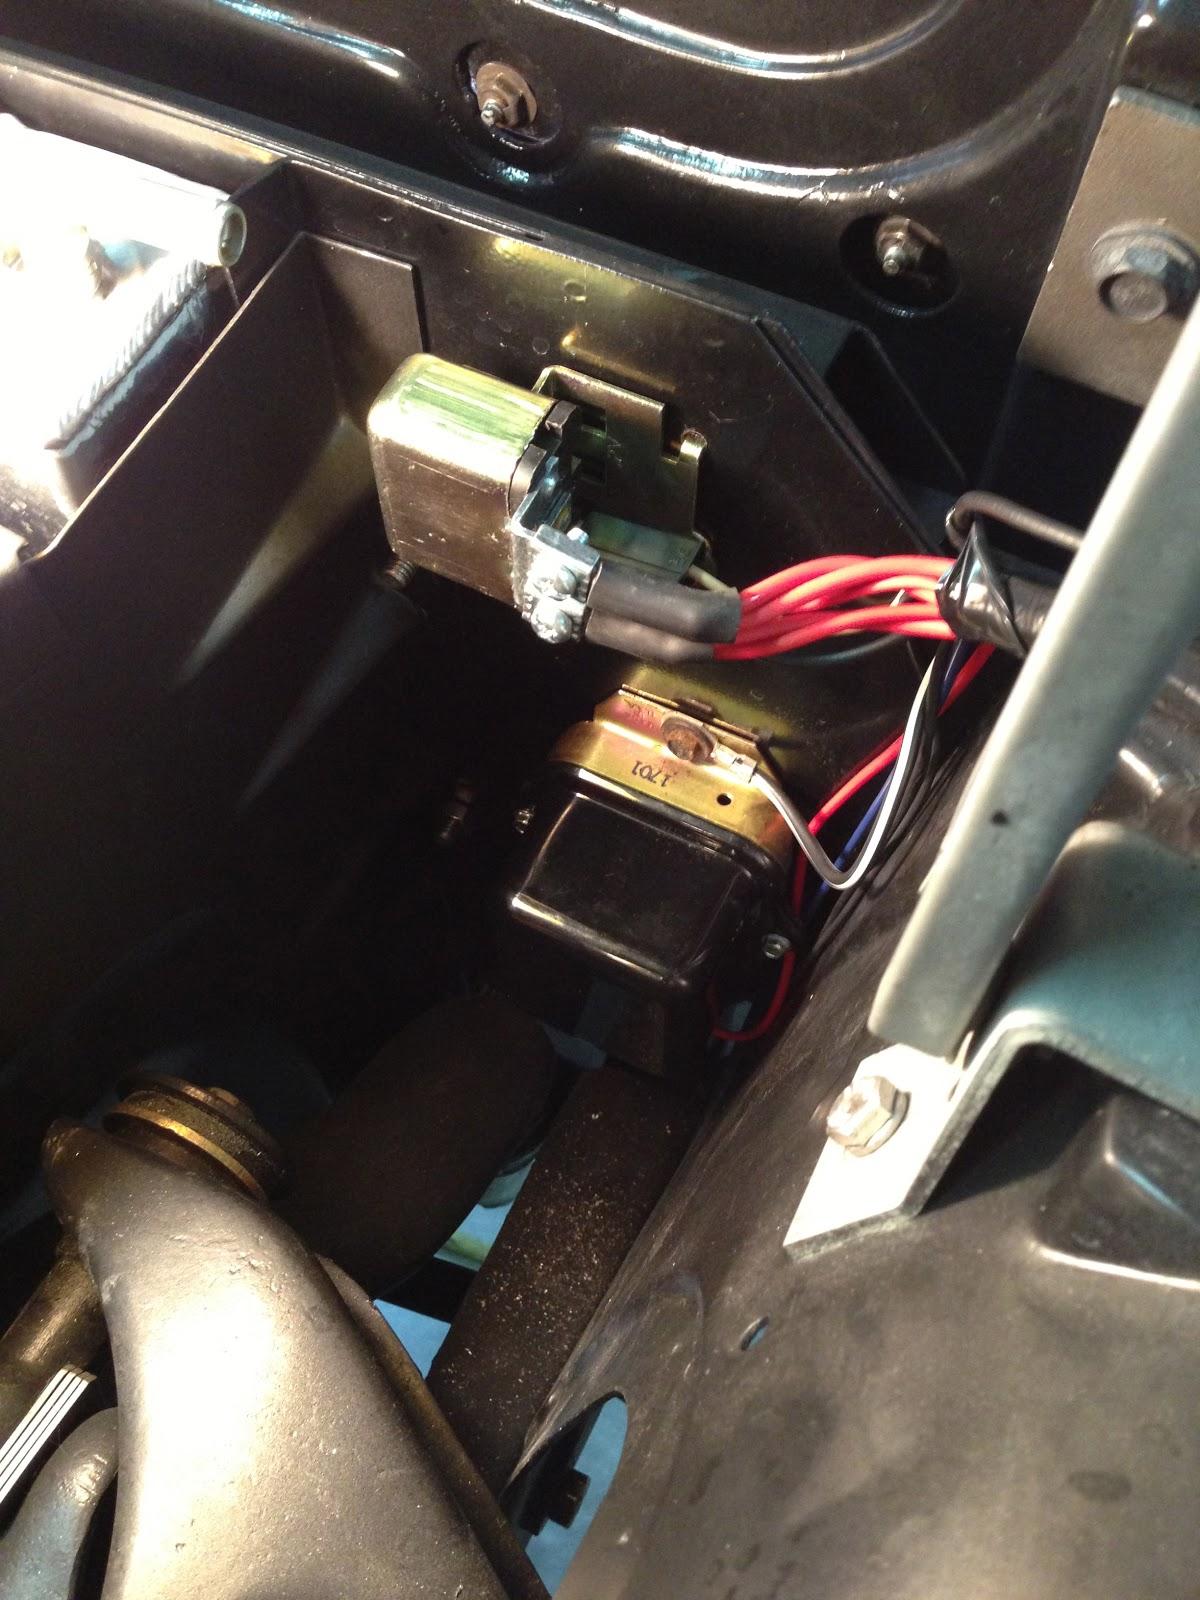 1963 corvette sting ray split window coupe restoration on the key voltage regulator adjustment 63 corvette 63 corvette voltage regulator wiring diagram  [ 1200 x 1600 Pixel ]